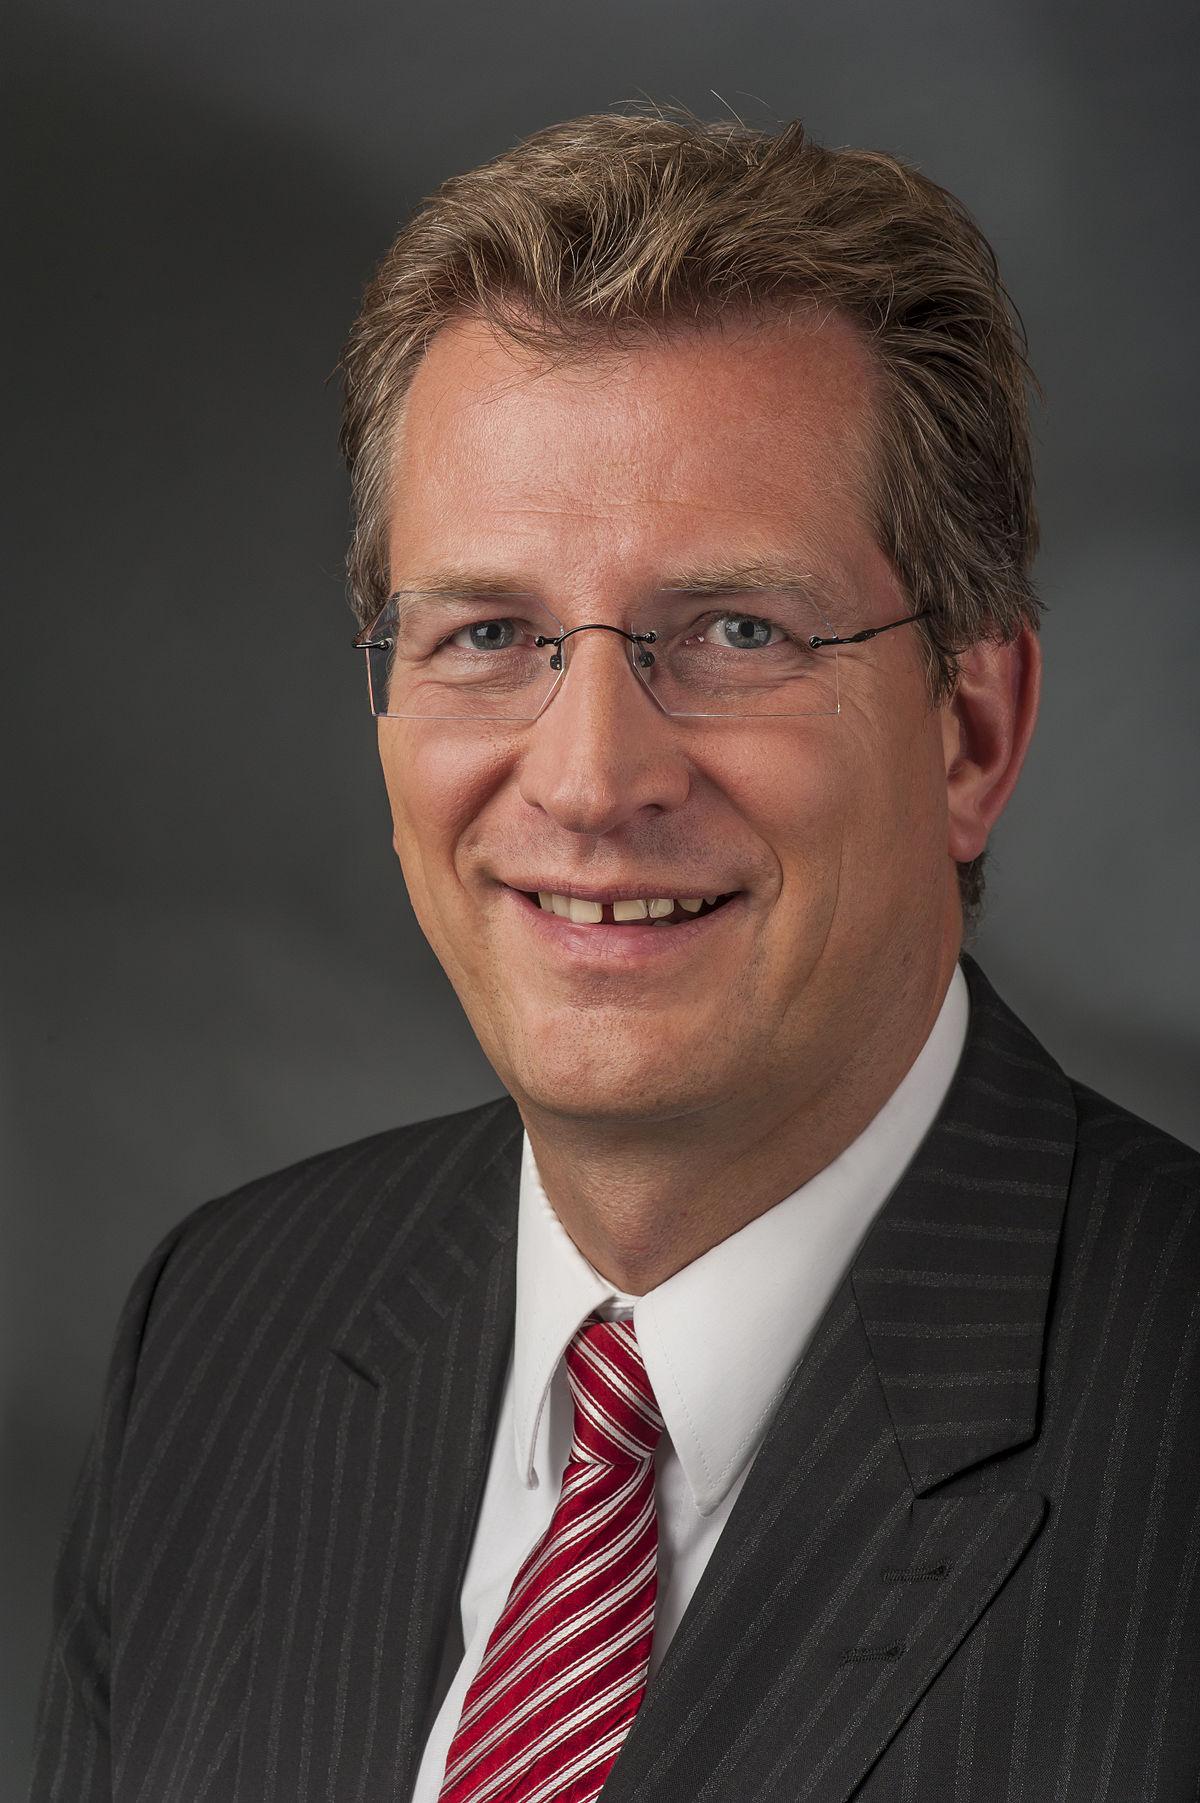 Ralf Brauksiepe